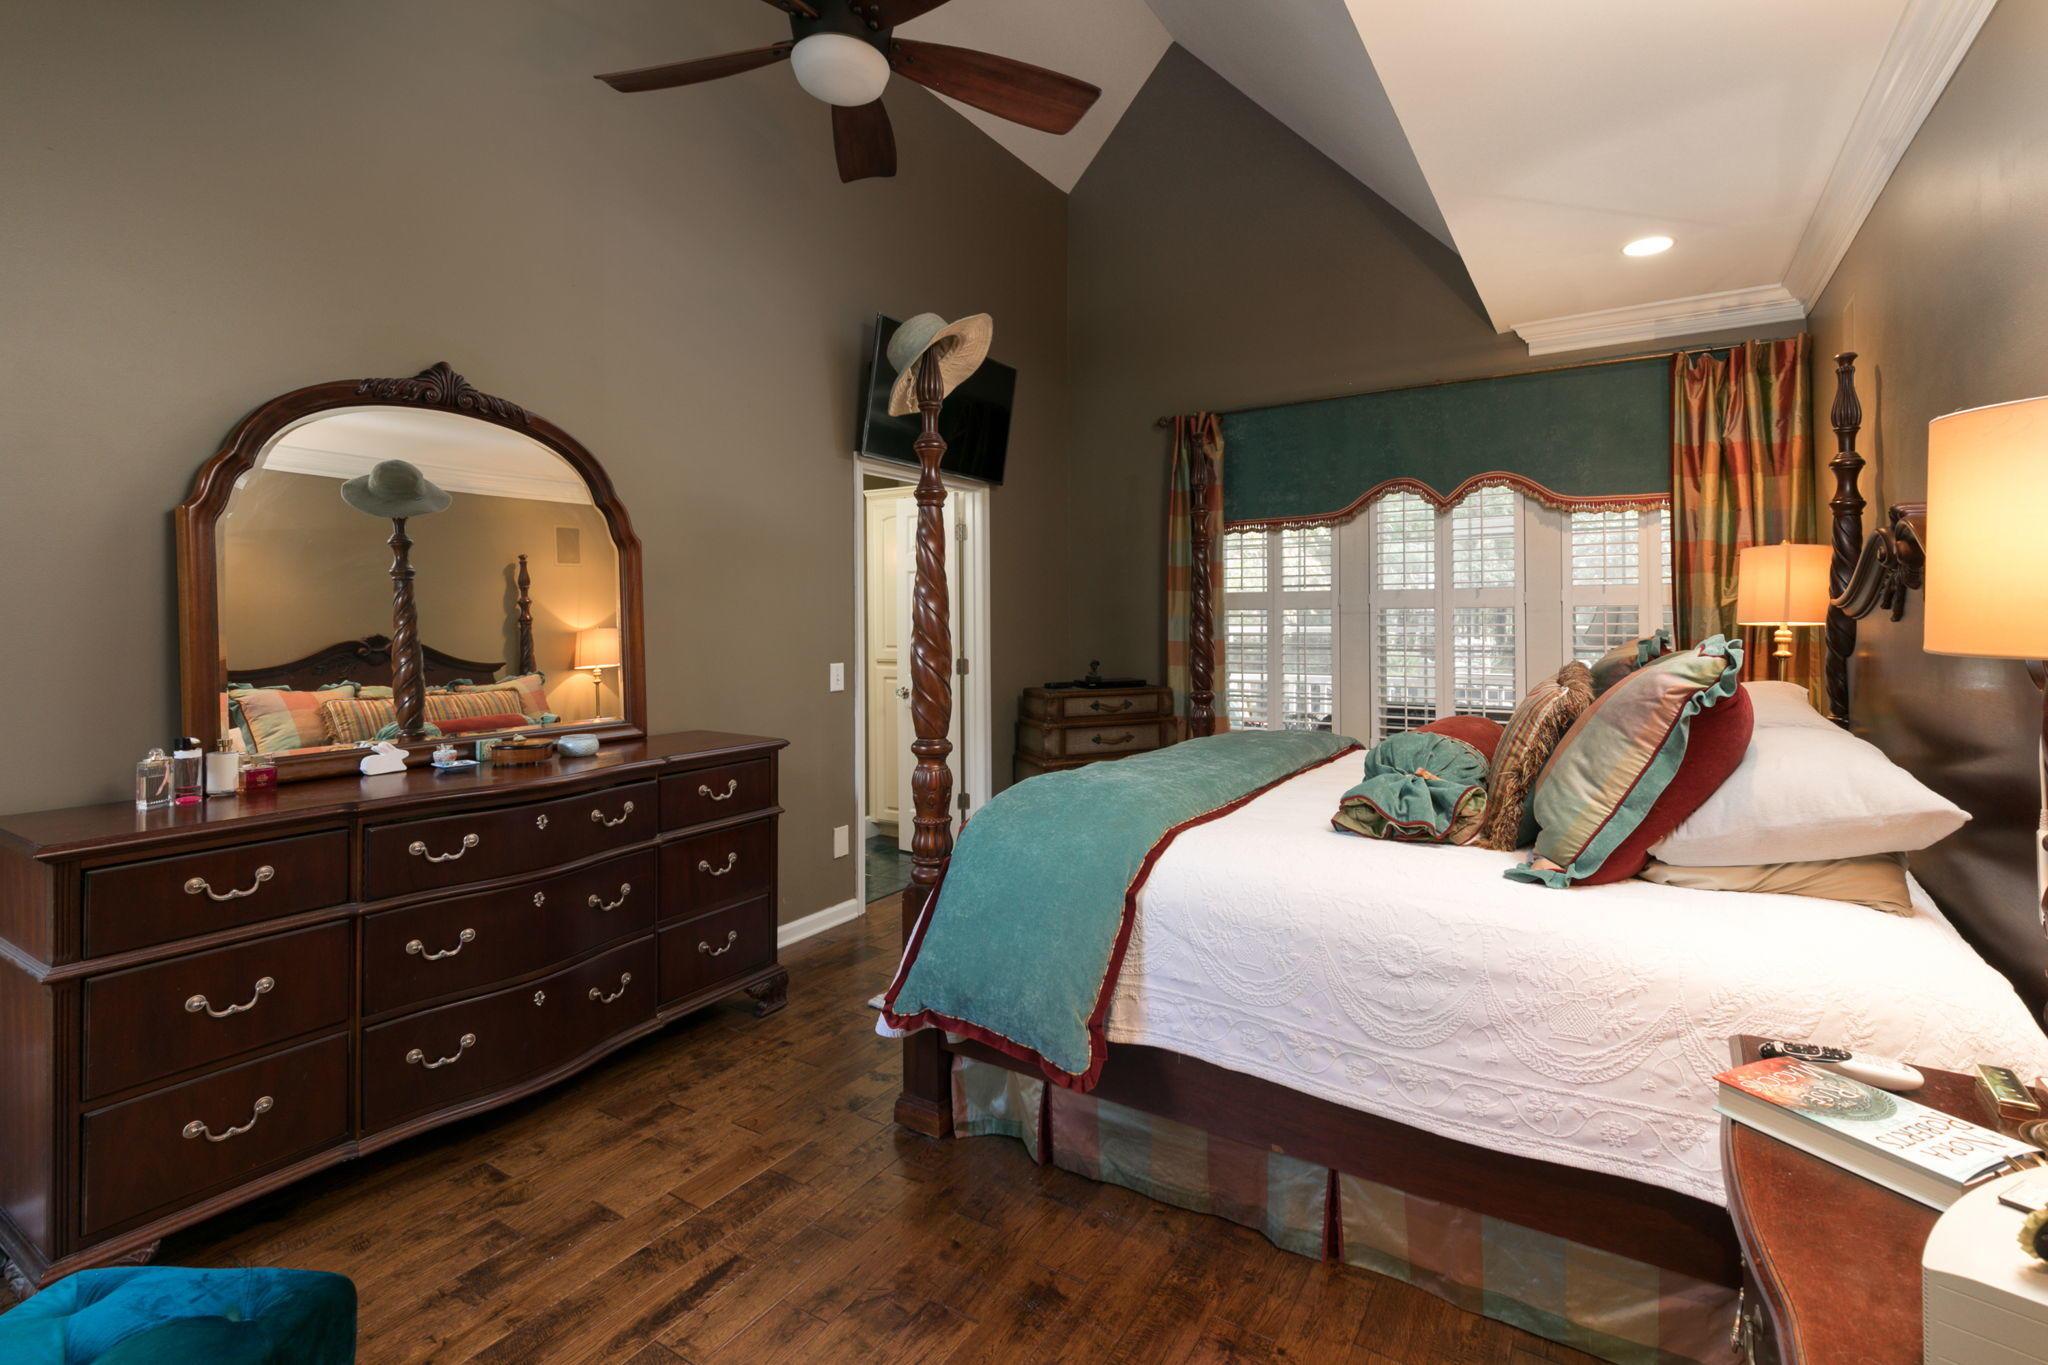 Dunes West Homes For Sale - 3625 Colonel Vanderhorst, Mount Pleasant, SC - 4